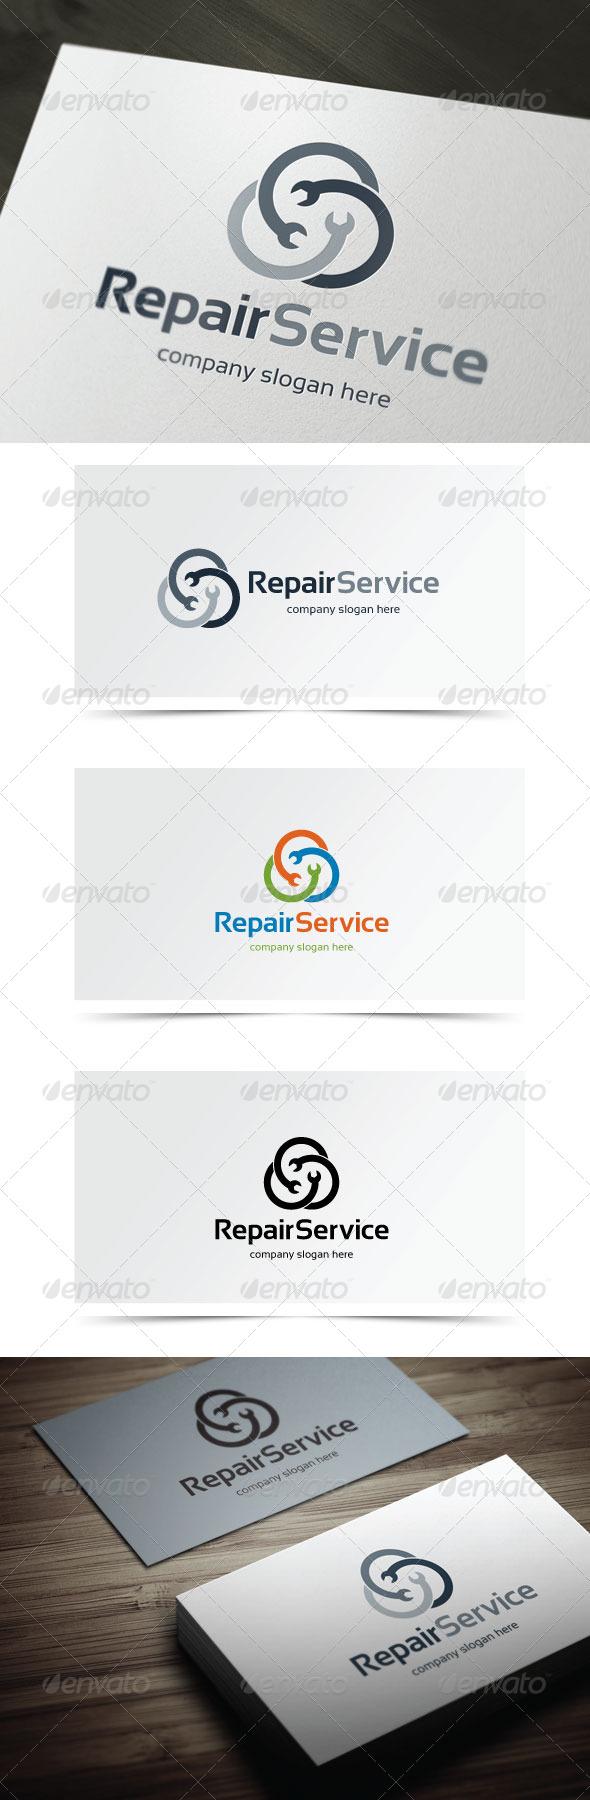 Repair Service - Symbols Logo Templates